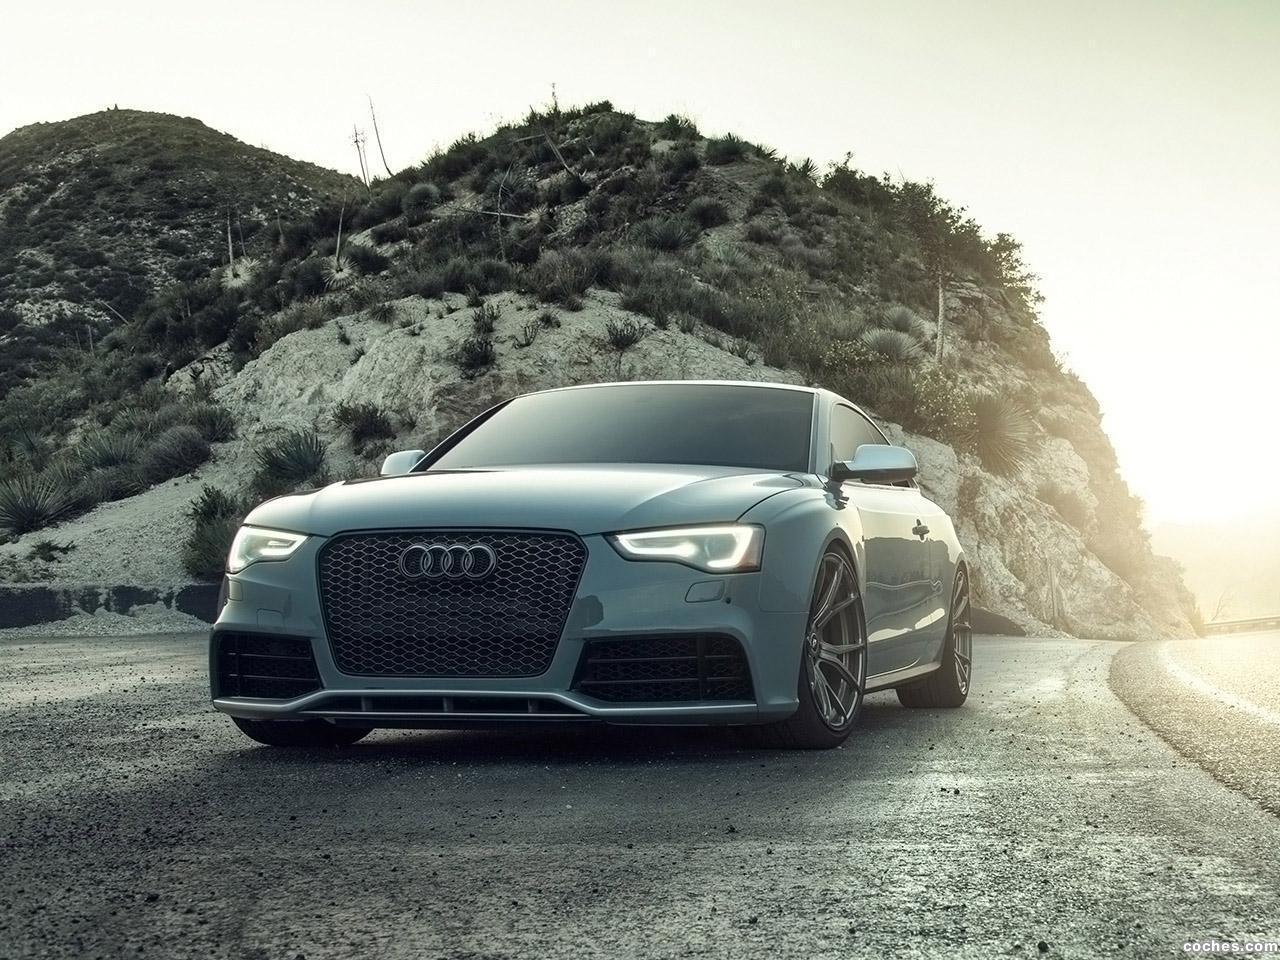 Tuning Cars Wallpapers Hd Fotos De Audi Vorsteiner Rs5 V Ff 103 2015 Foto 1